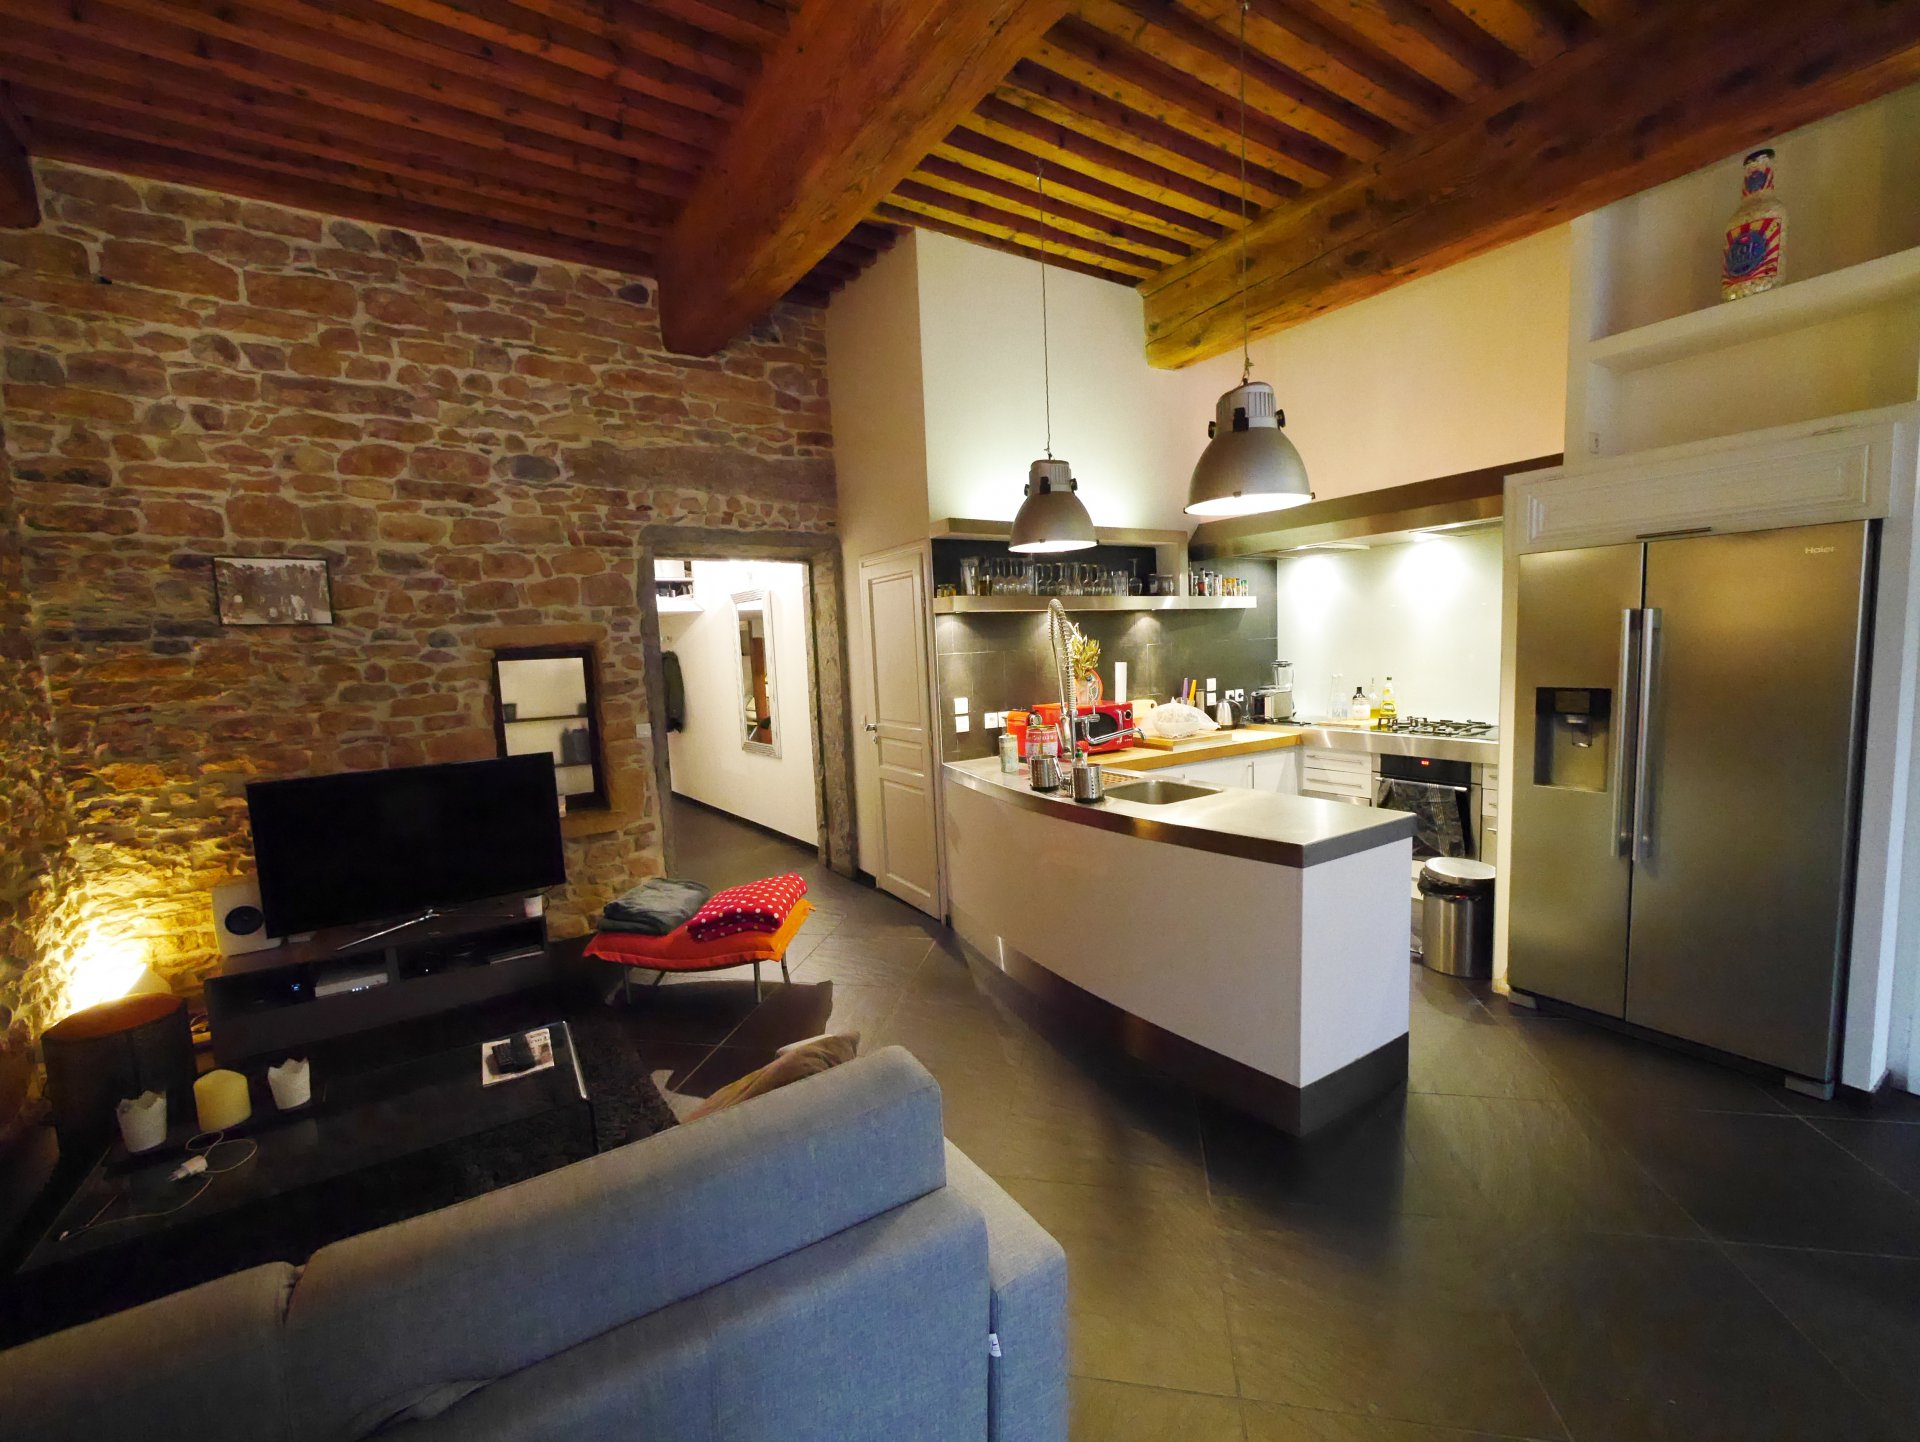 Stainless steel, exposed bricks, kitchen island